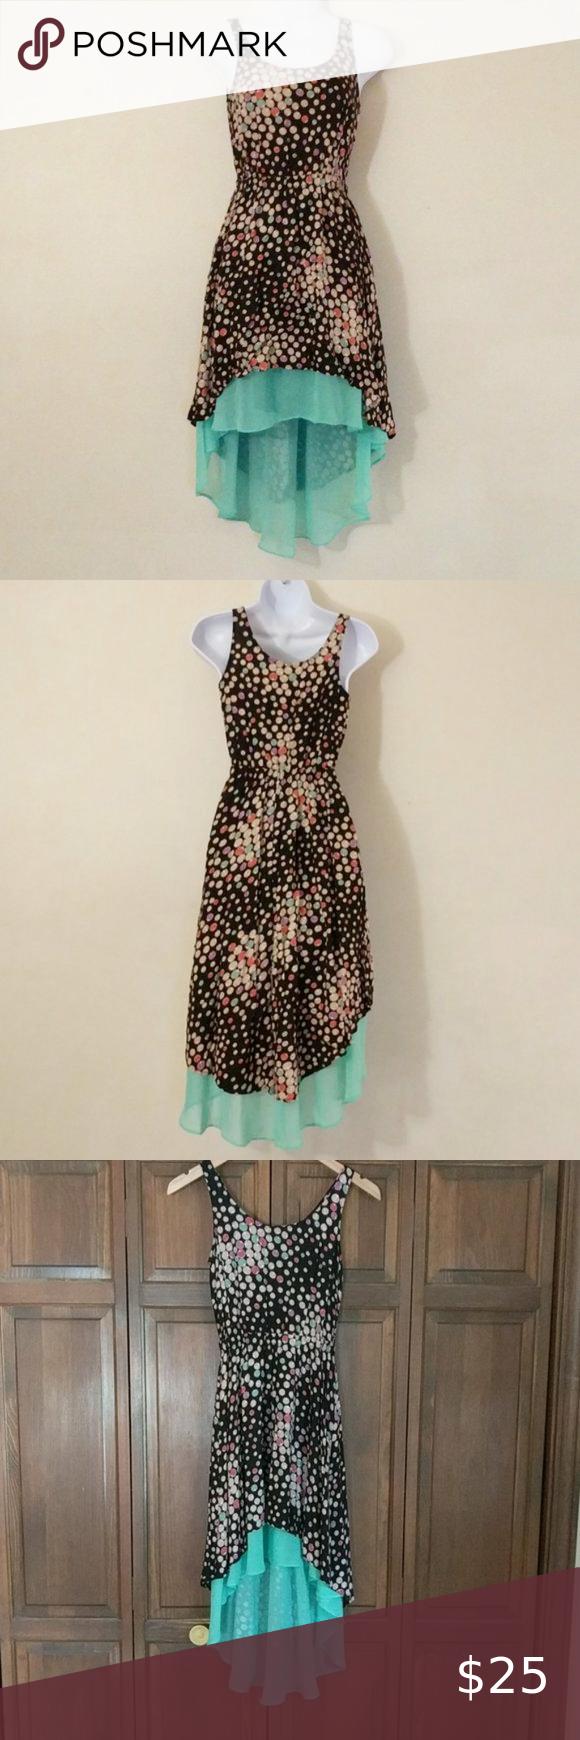 Xhilaration Xs Tp Hi Low Summer Dress Summer Dresses Blue High Low Dress Sheer Mini Dress [ 1740 x 580 Pixel ]